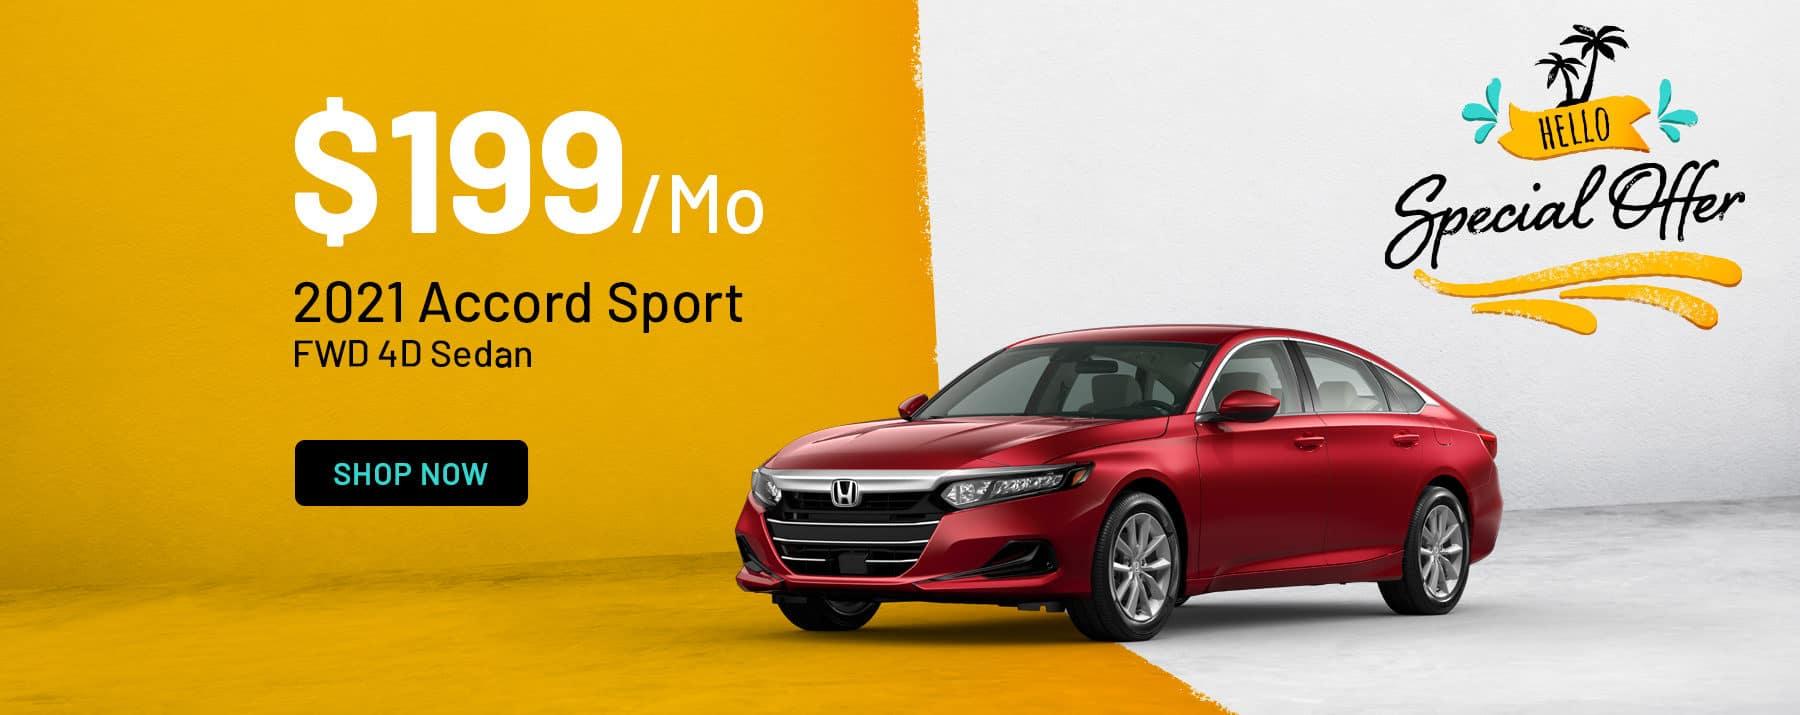 2021 Honda Accord Special Offer